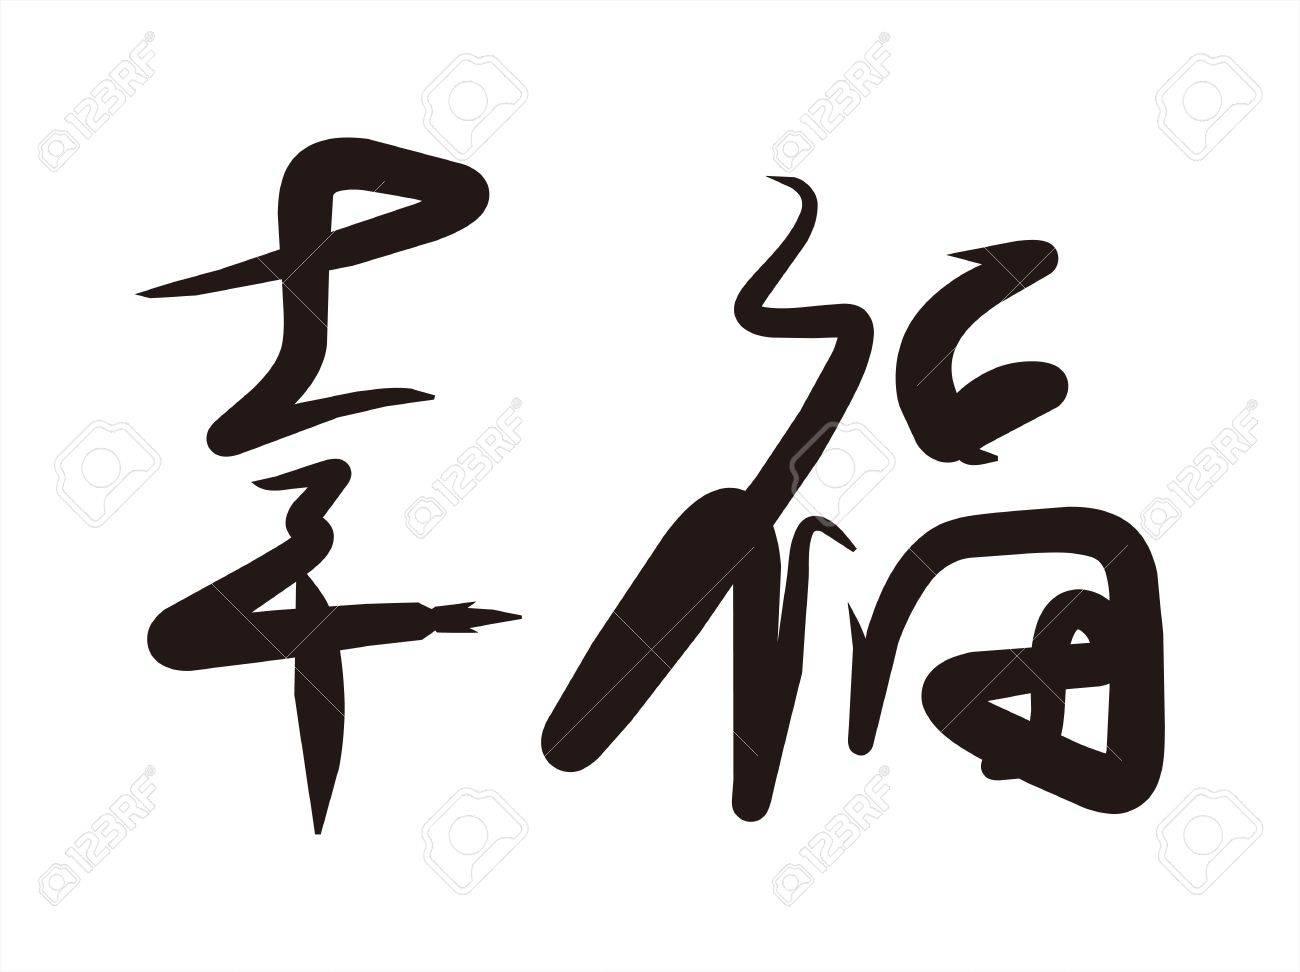 Préférence Calligraphie Chinoise Bonheur MP52 | Jornalagora JR48